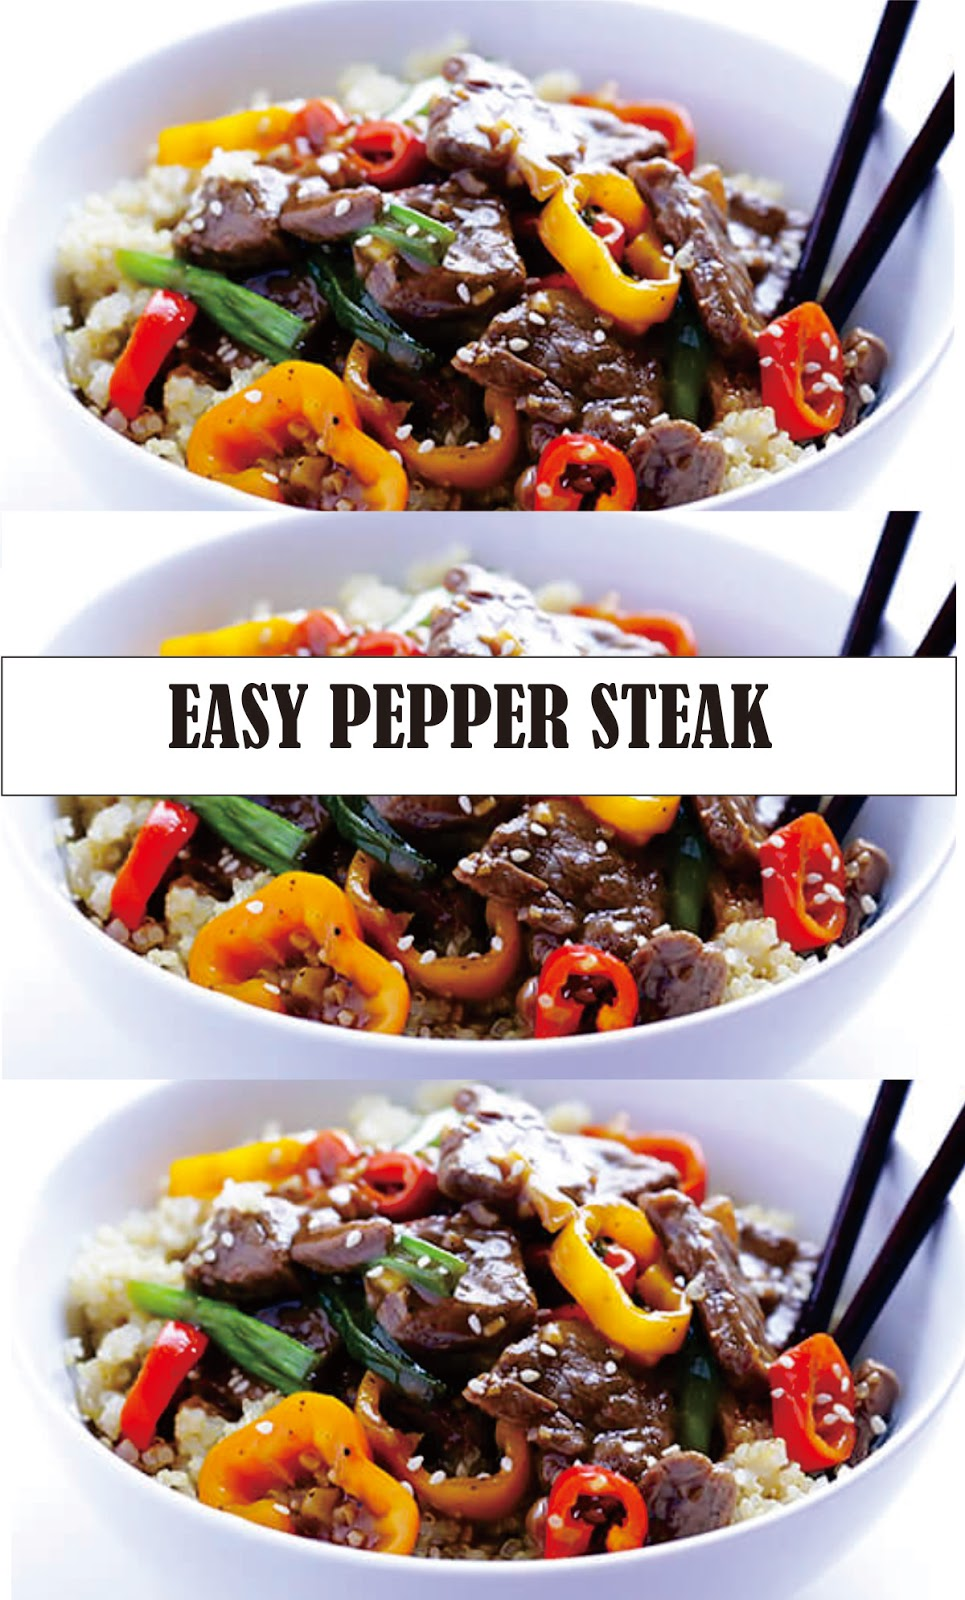 EASY PEPPER STEAK | Super Recipes | Stuffed peppers ...